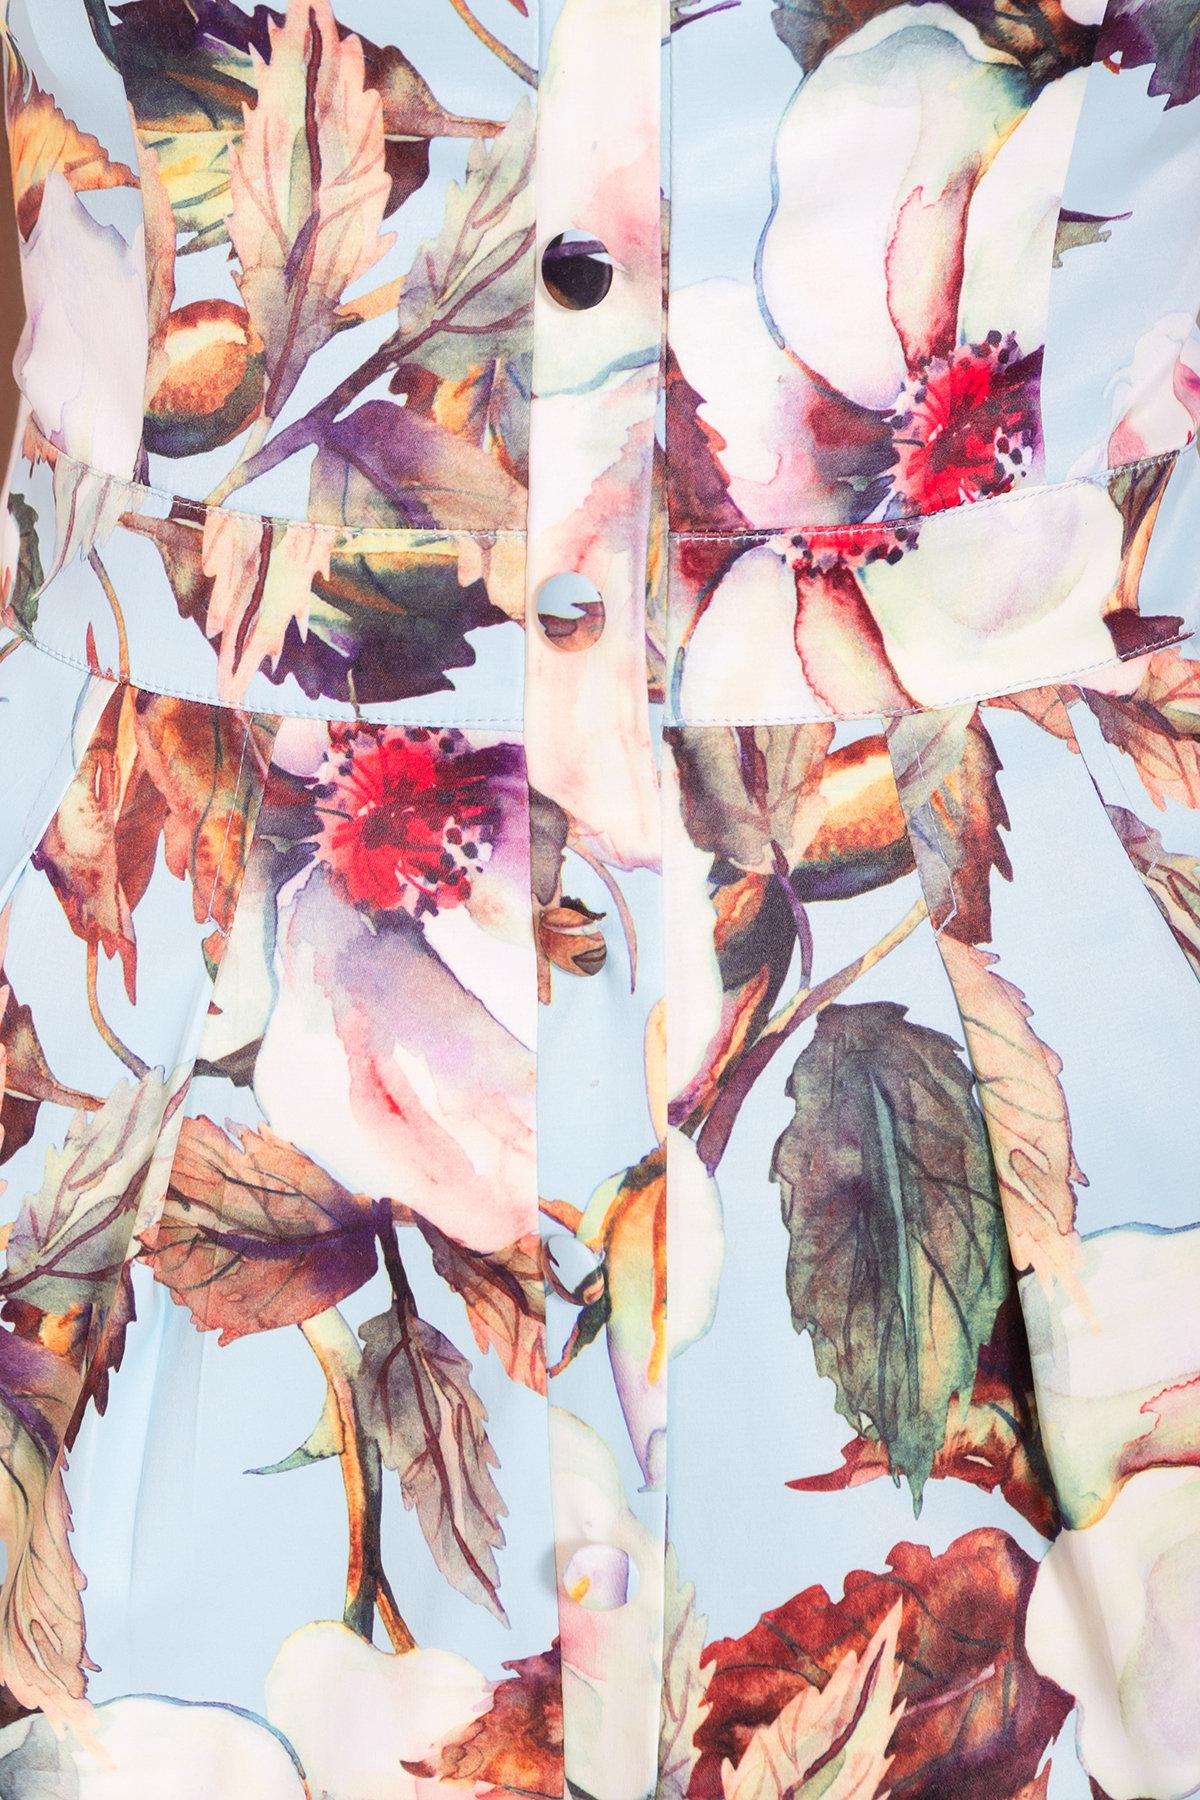 Платье Унгаро 7273 АРТ. 43145 Цвет: Цветы кр голуб/молок - фото 4, интернет магазин tm-modus.ru